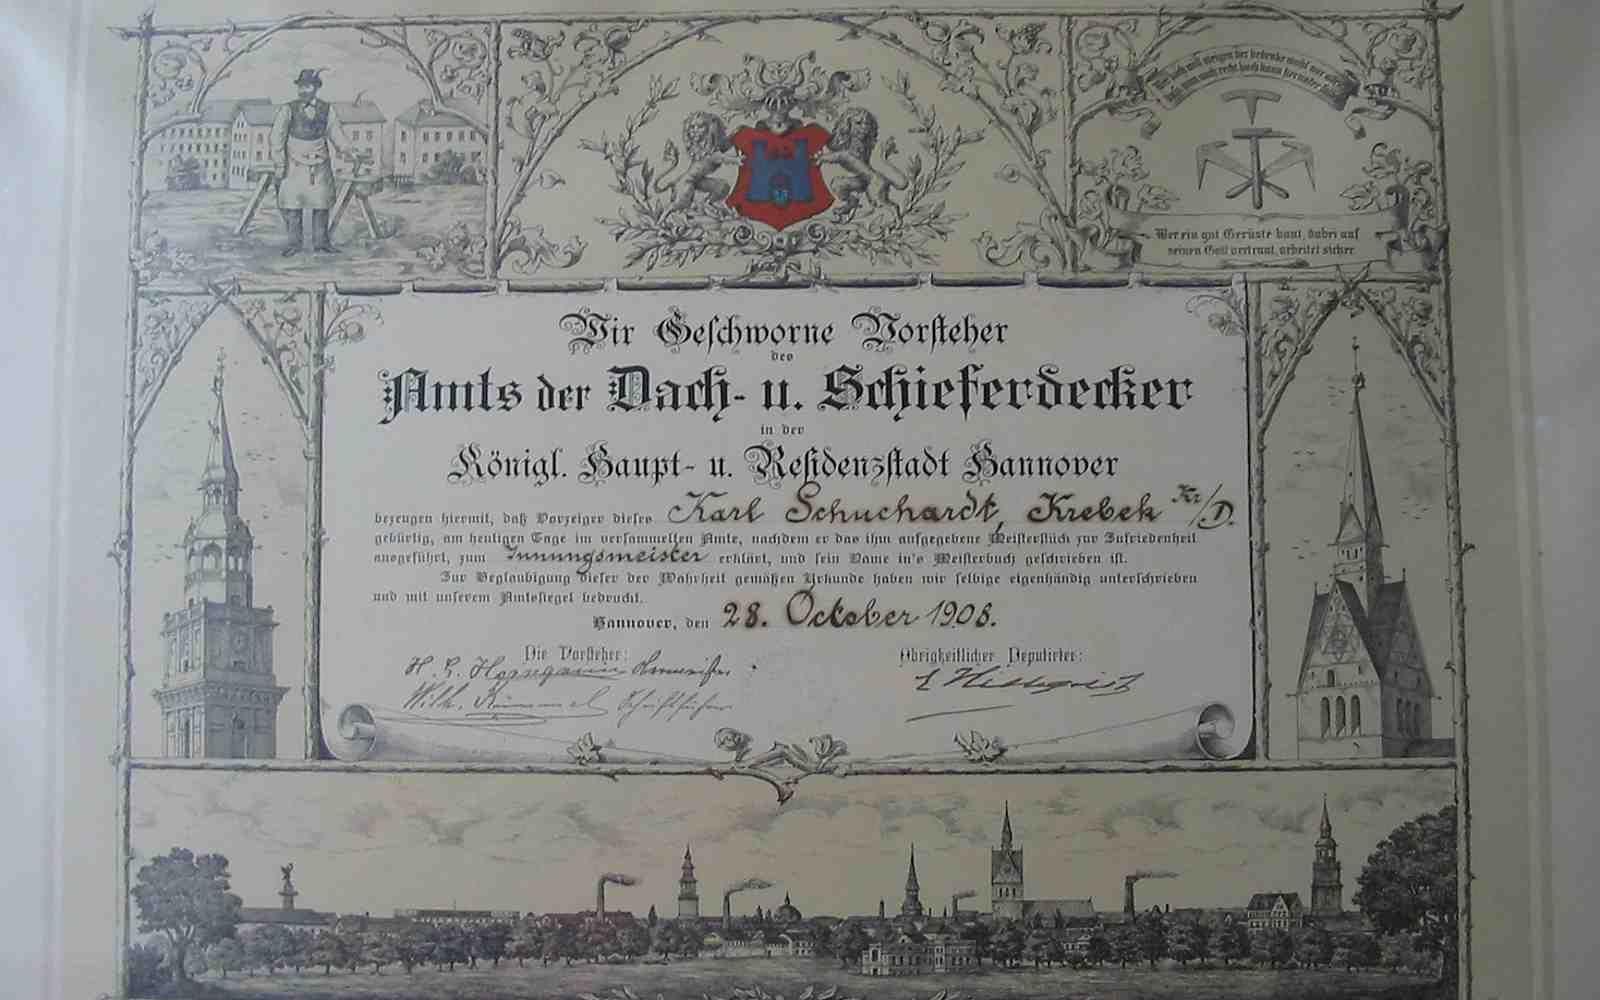 Dachdeckermeister Bernd Schuchardt